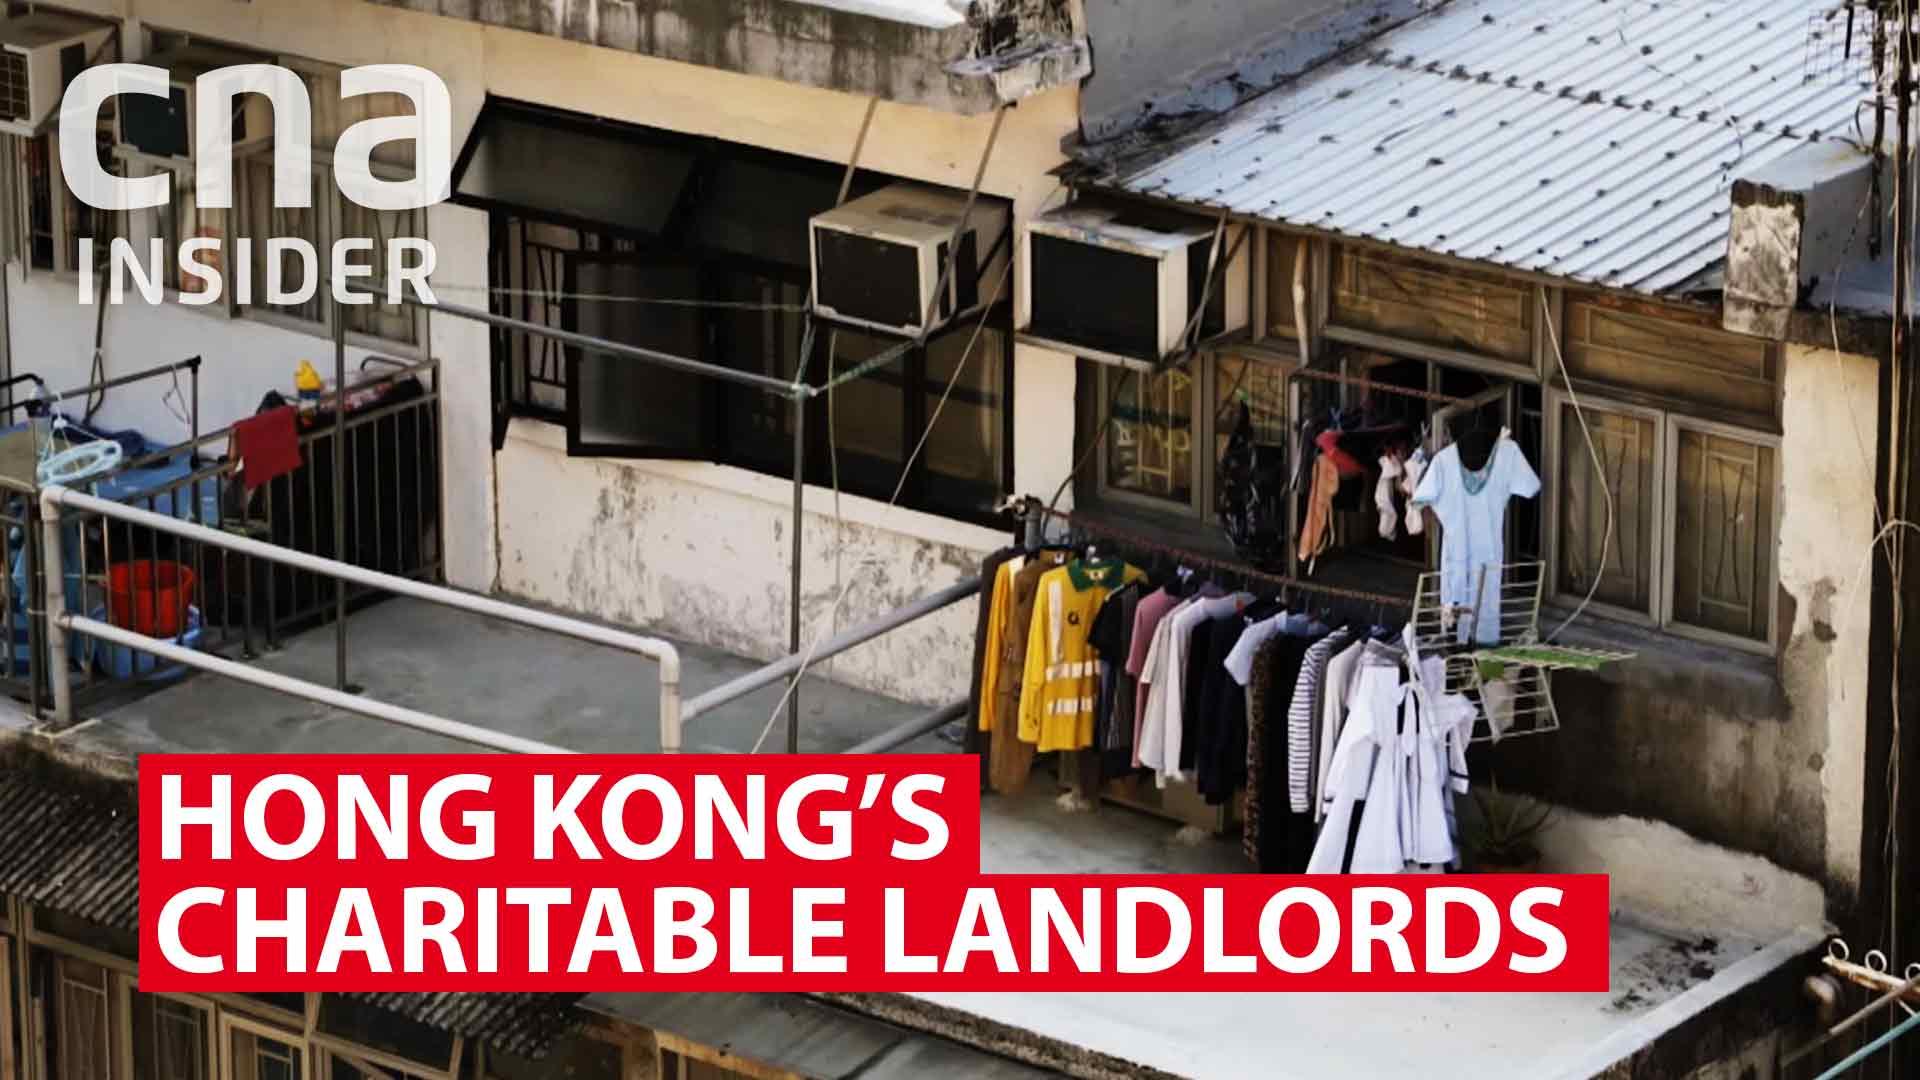 Hong Kong's charitable landlords